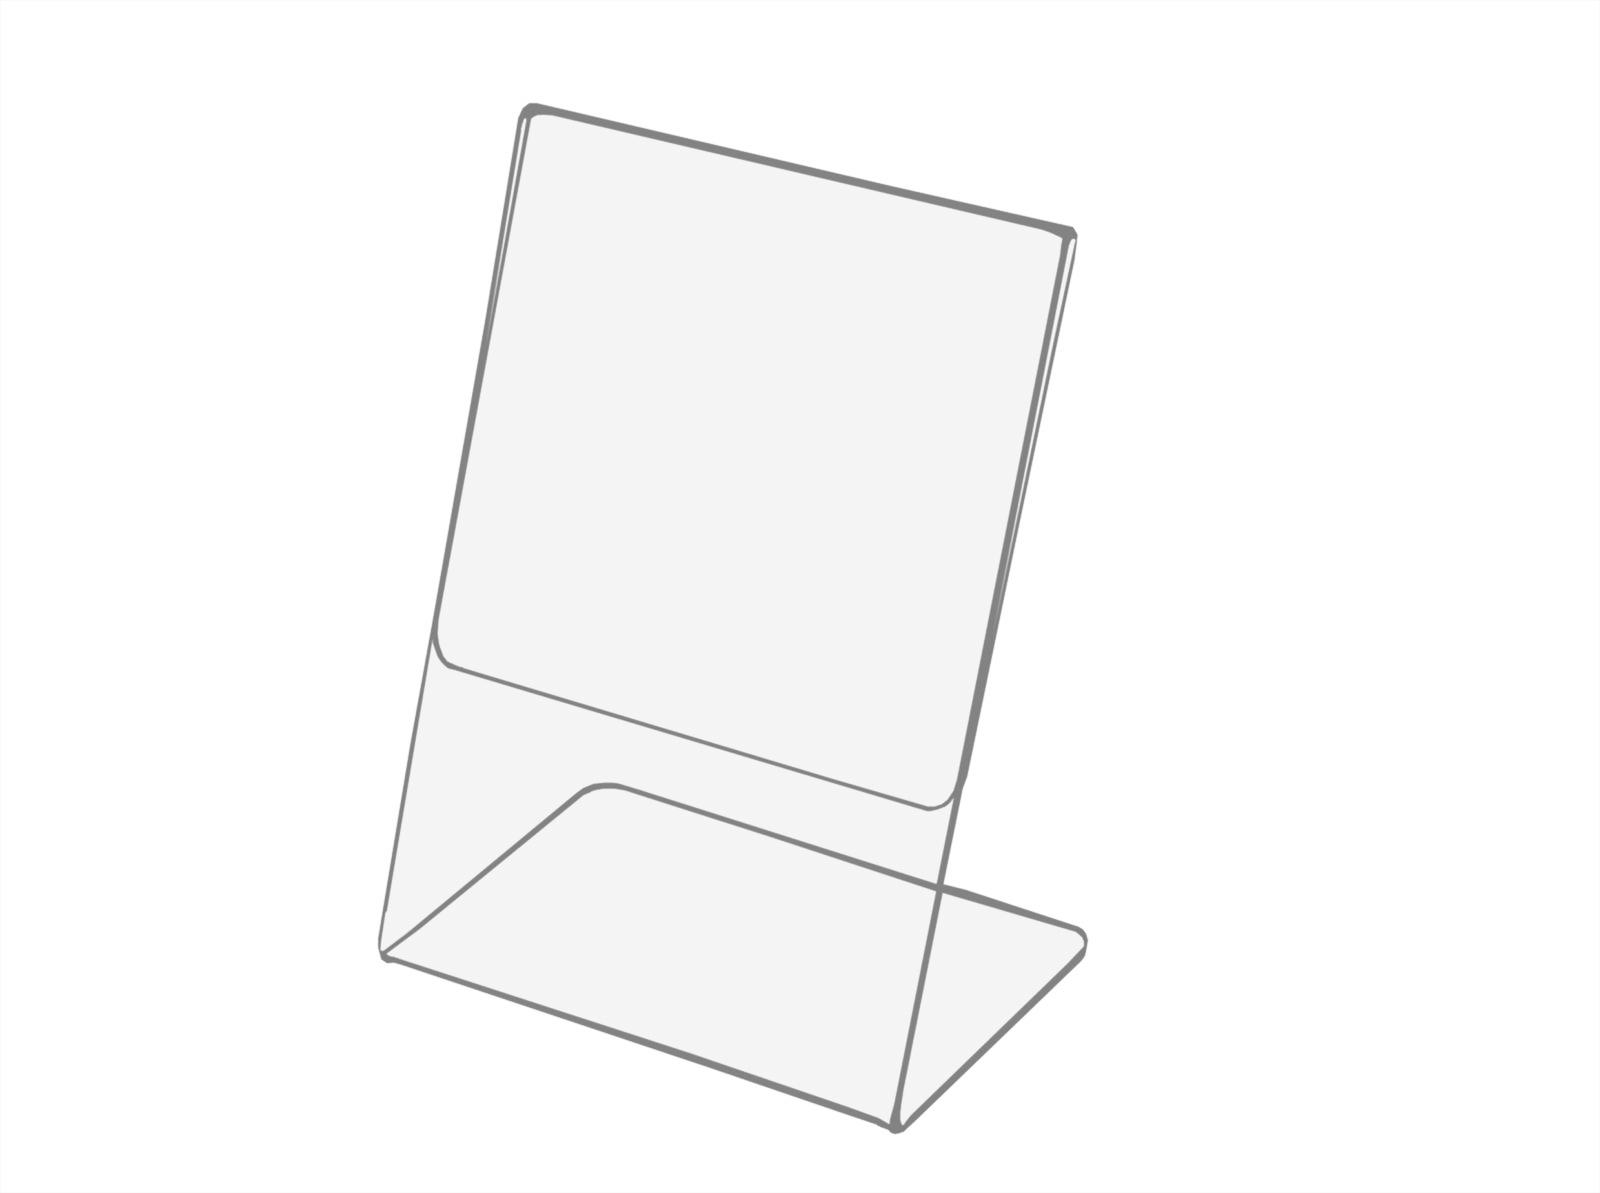 A5 Cenový stojan, popis, leták - Závery z plexi